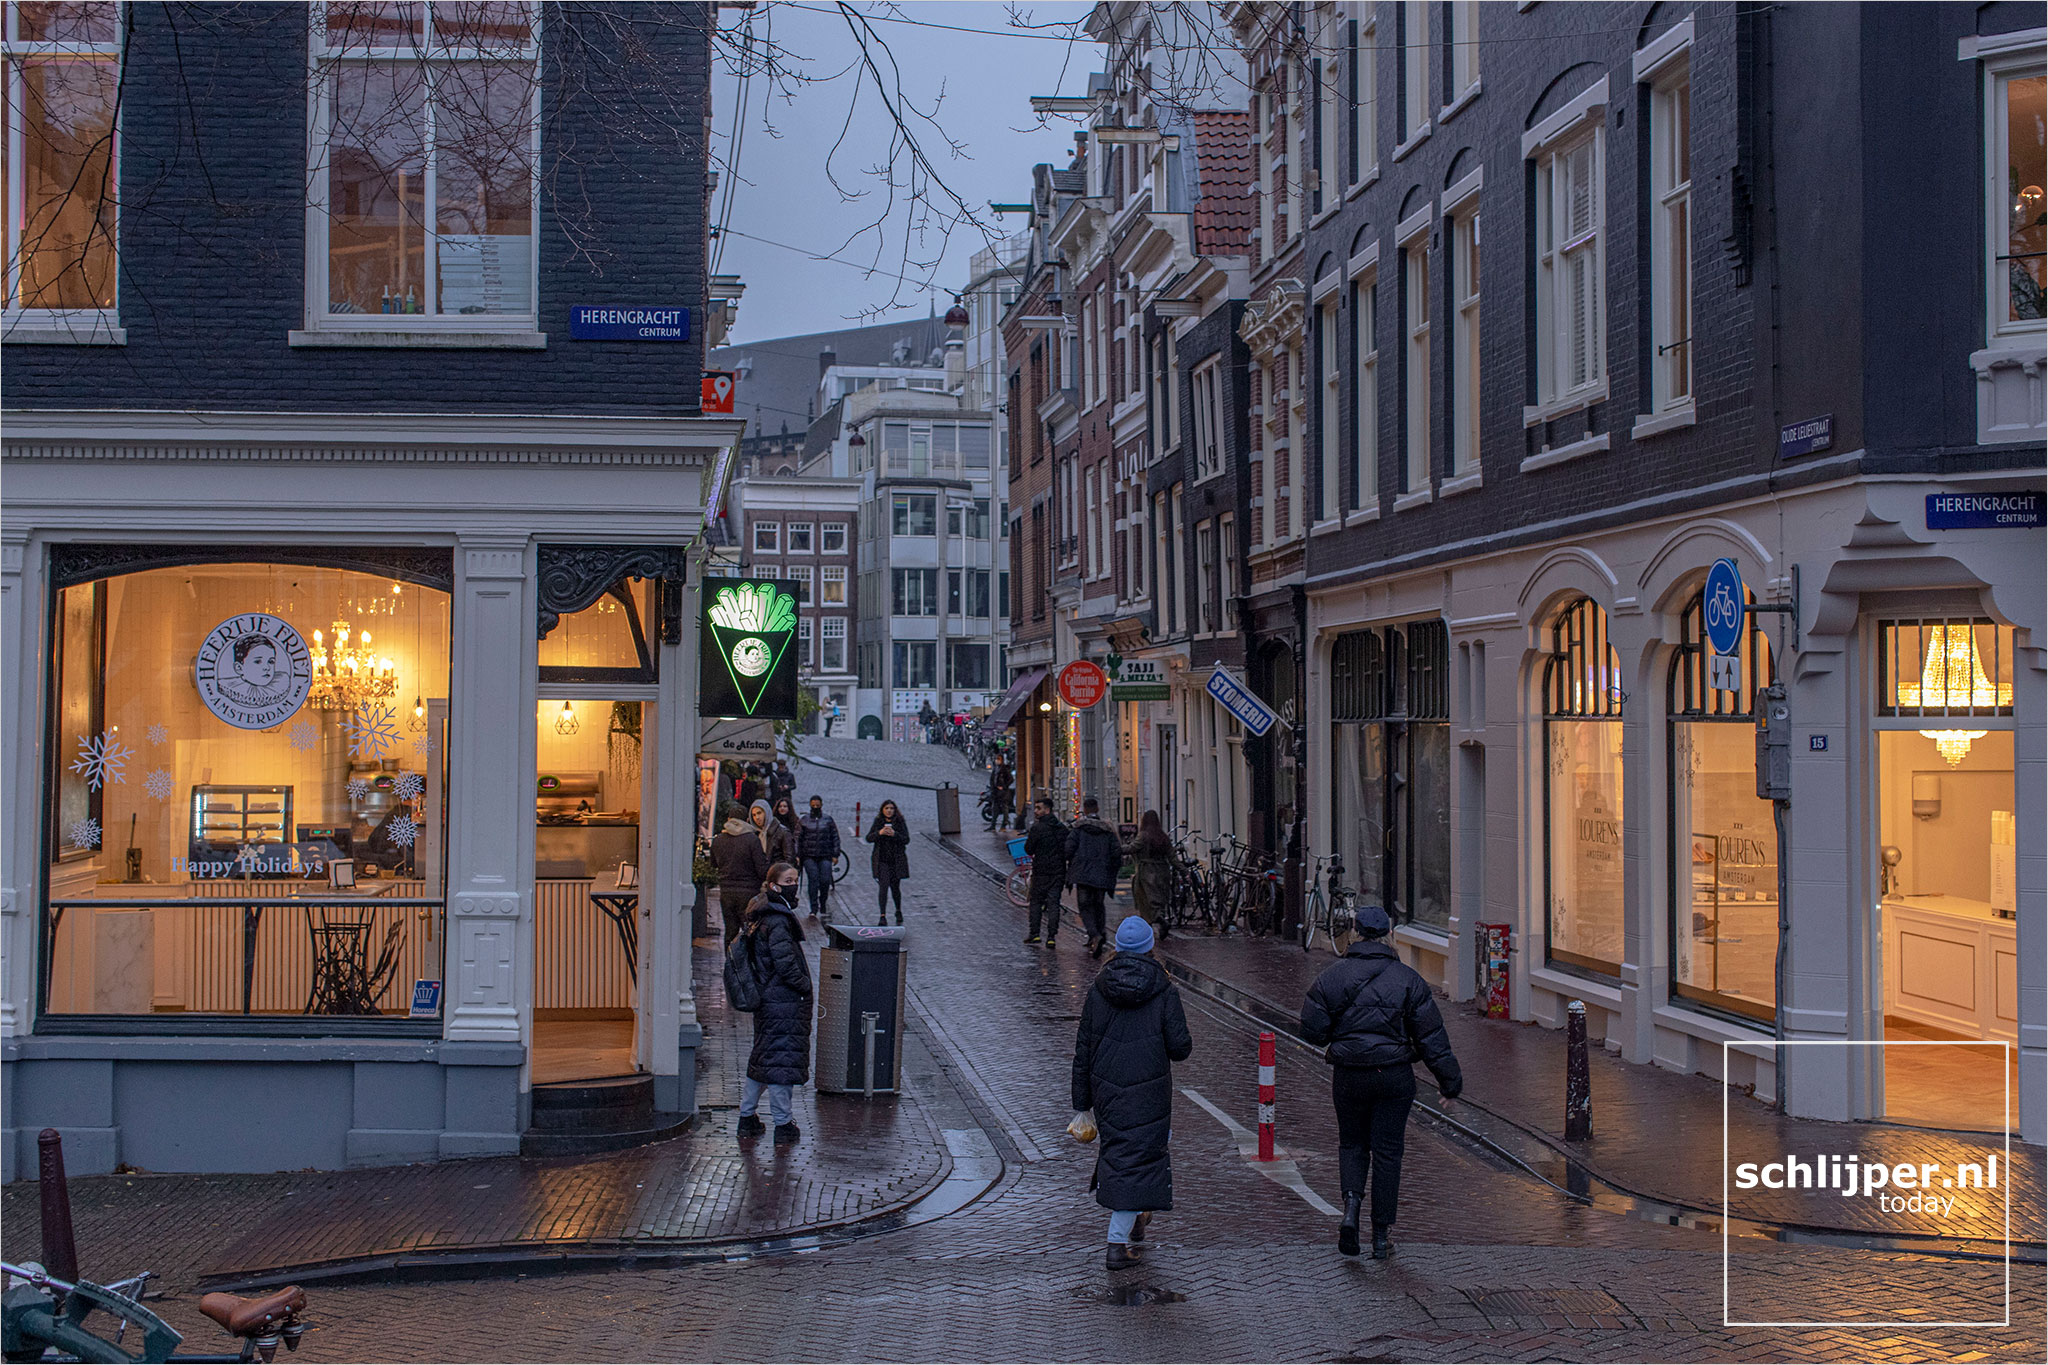 The Netherlands, Amsterdam, 12 december 2020